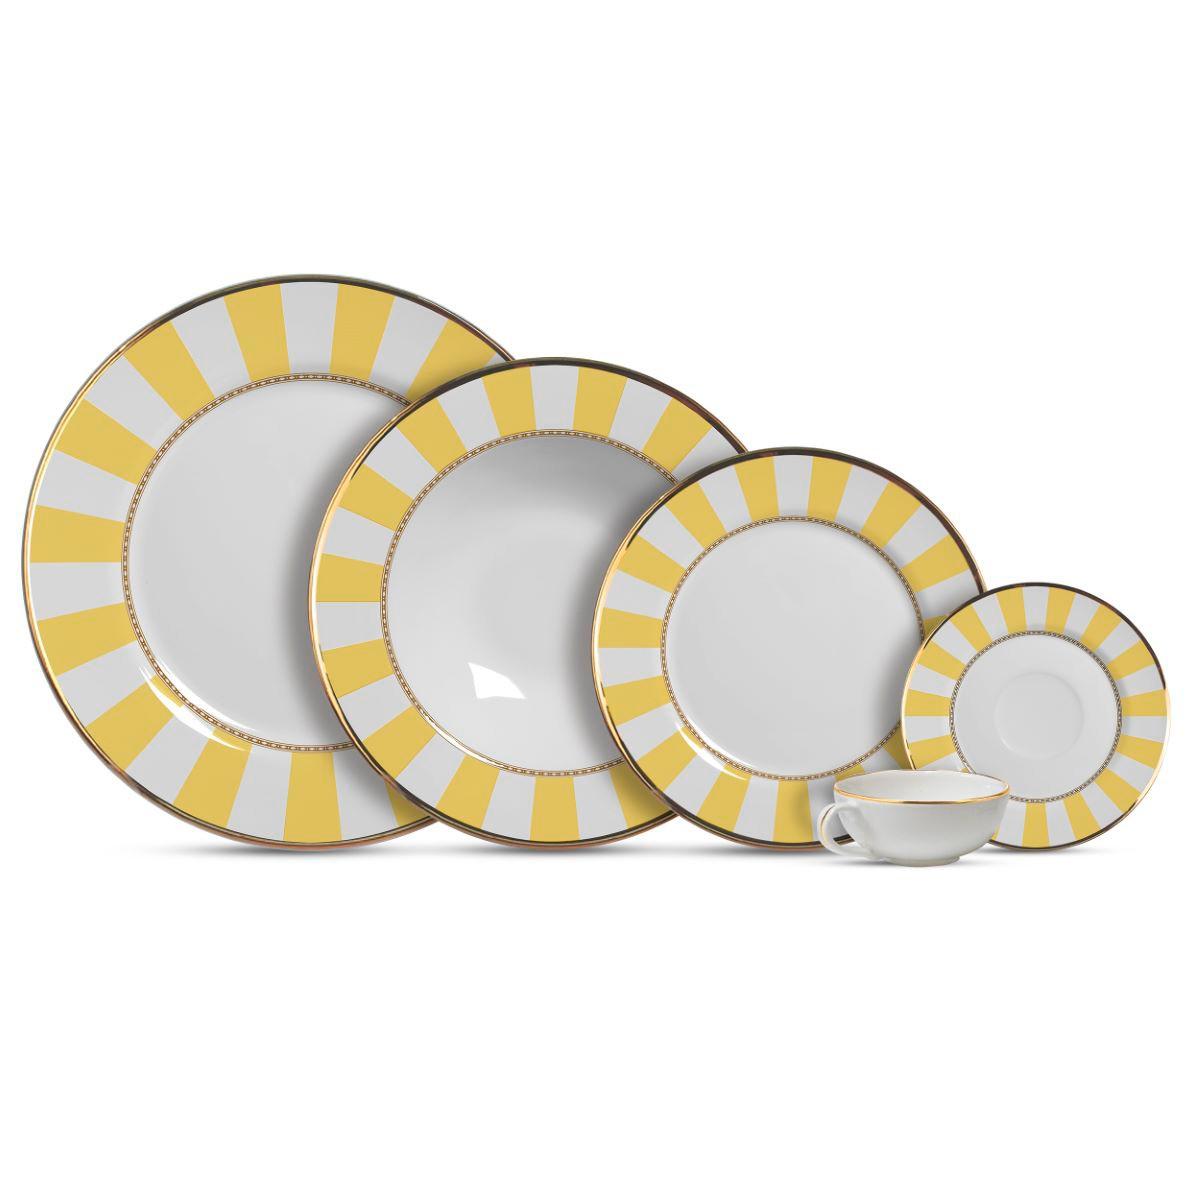 Aparelho de Jantar Cerâmica Yellow Strip 20 Pç